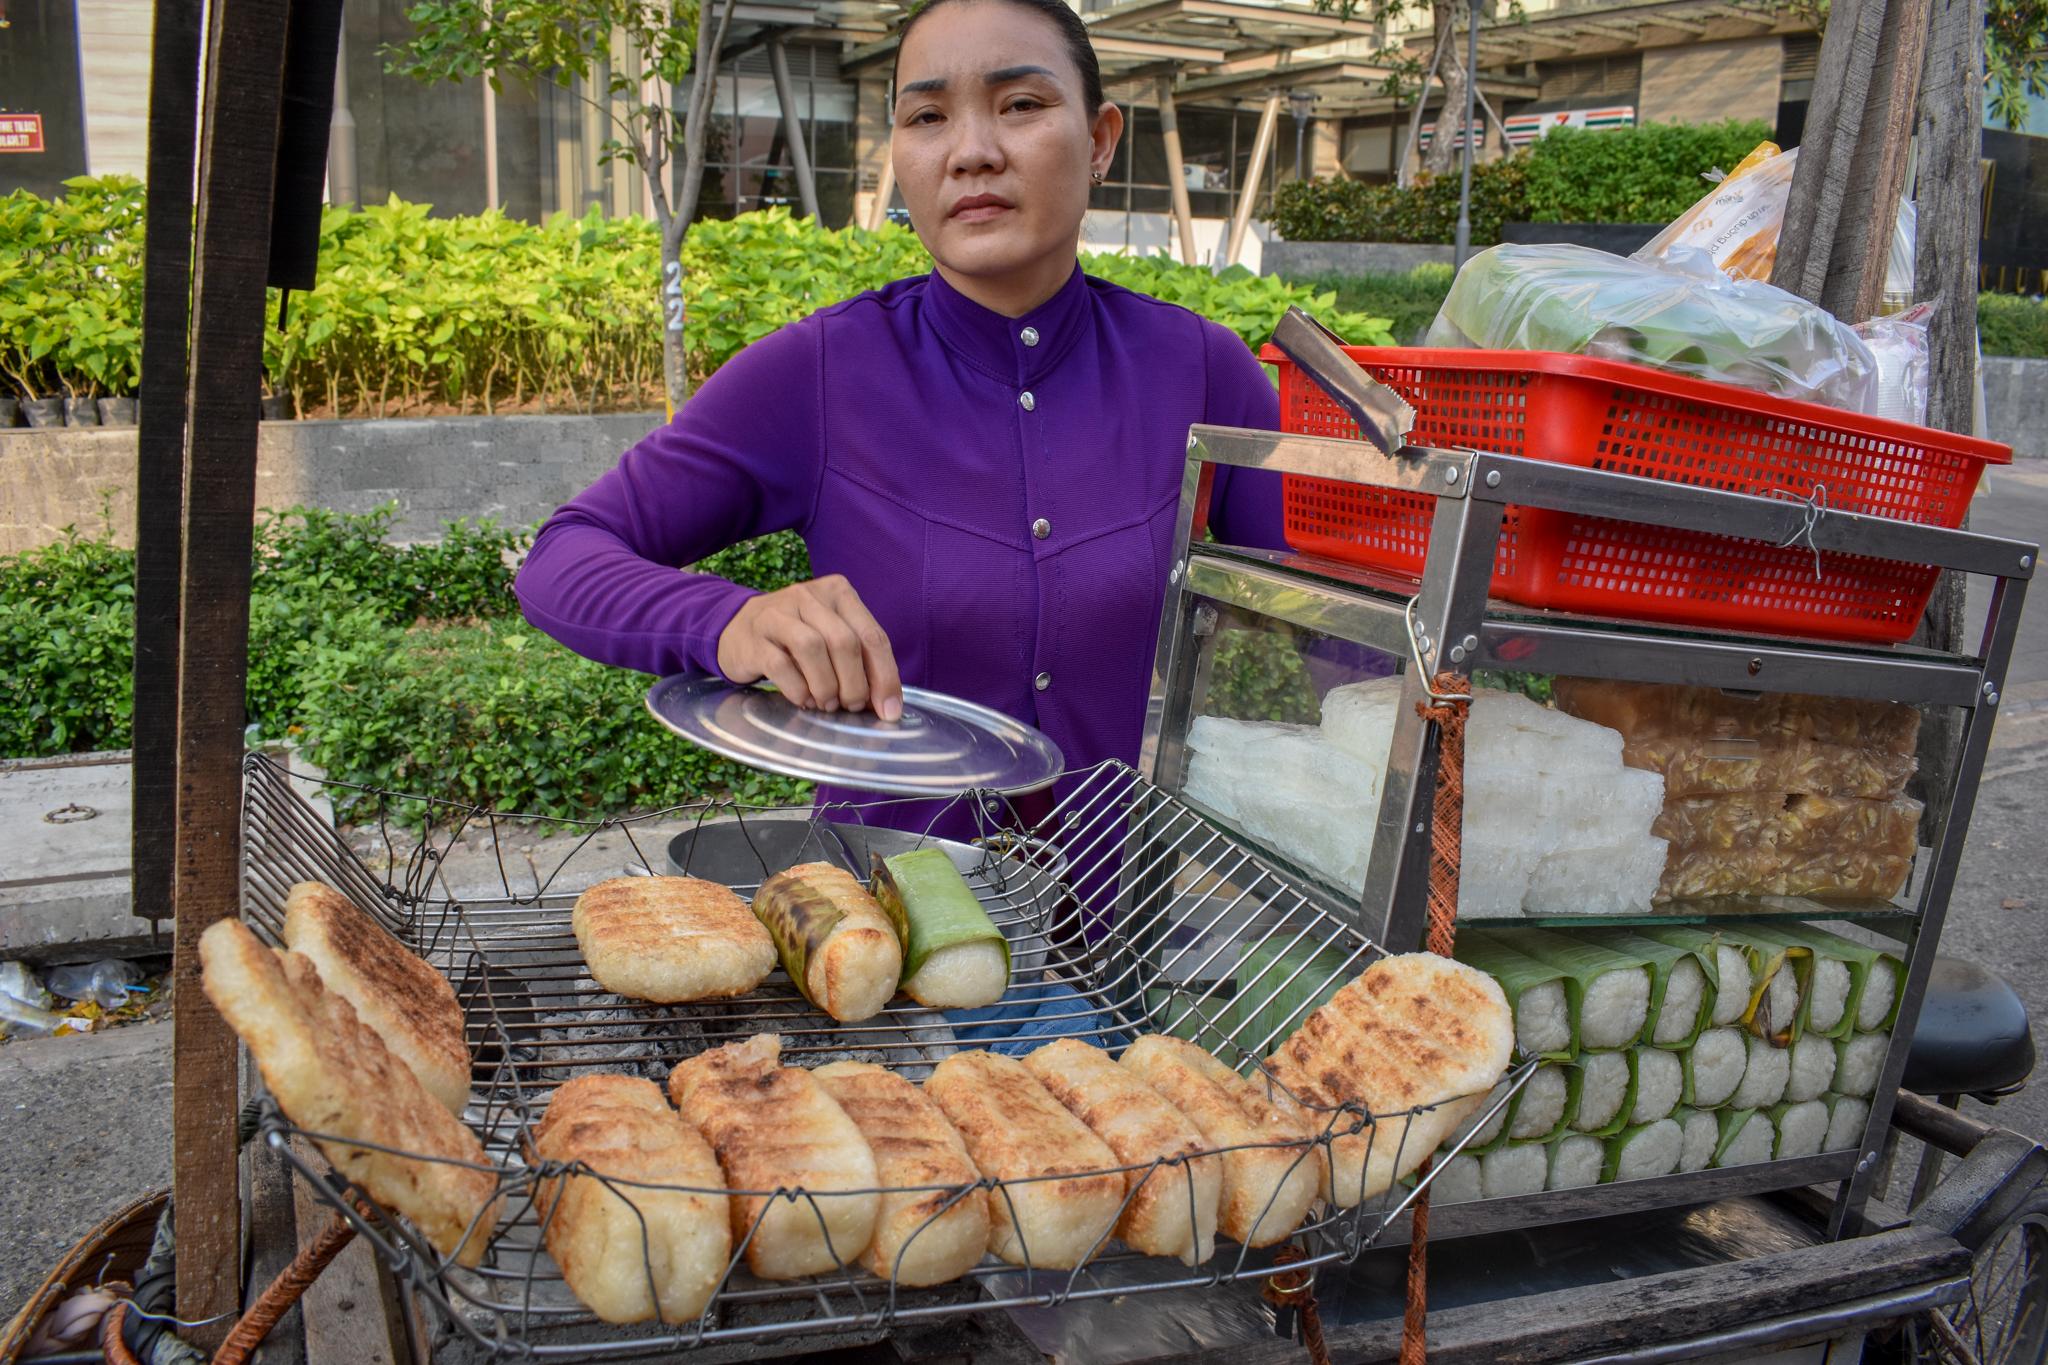 Uprooted-Traveler-Vietnam-Vegan-Fried-Banana-Chuoi-nuong-saigon-guide.jpg